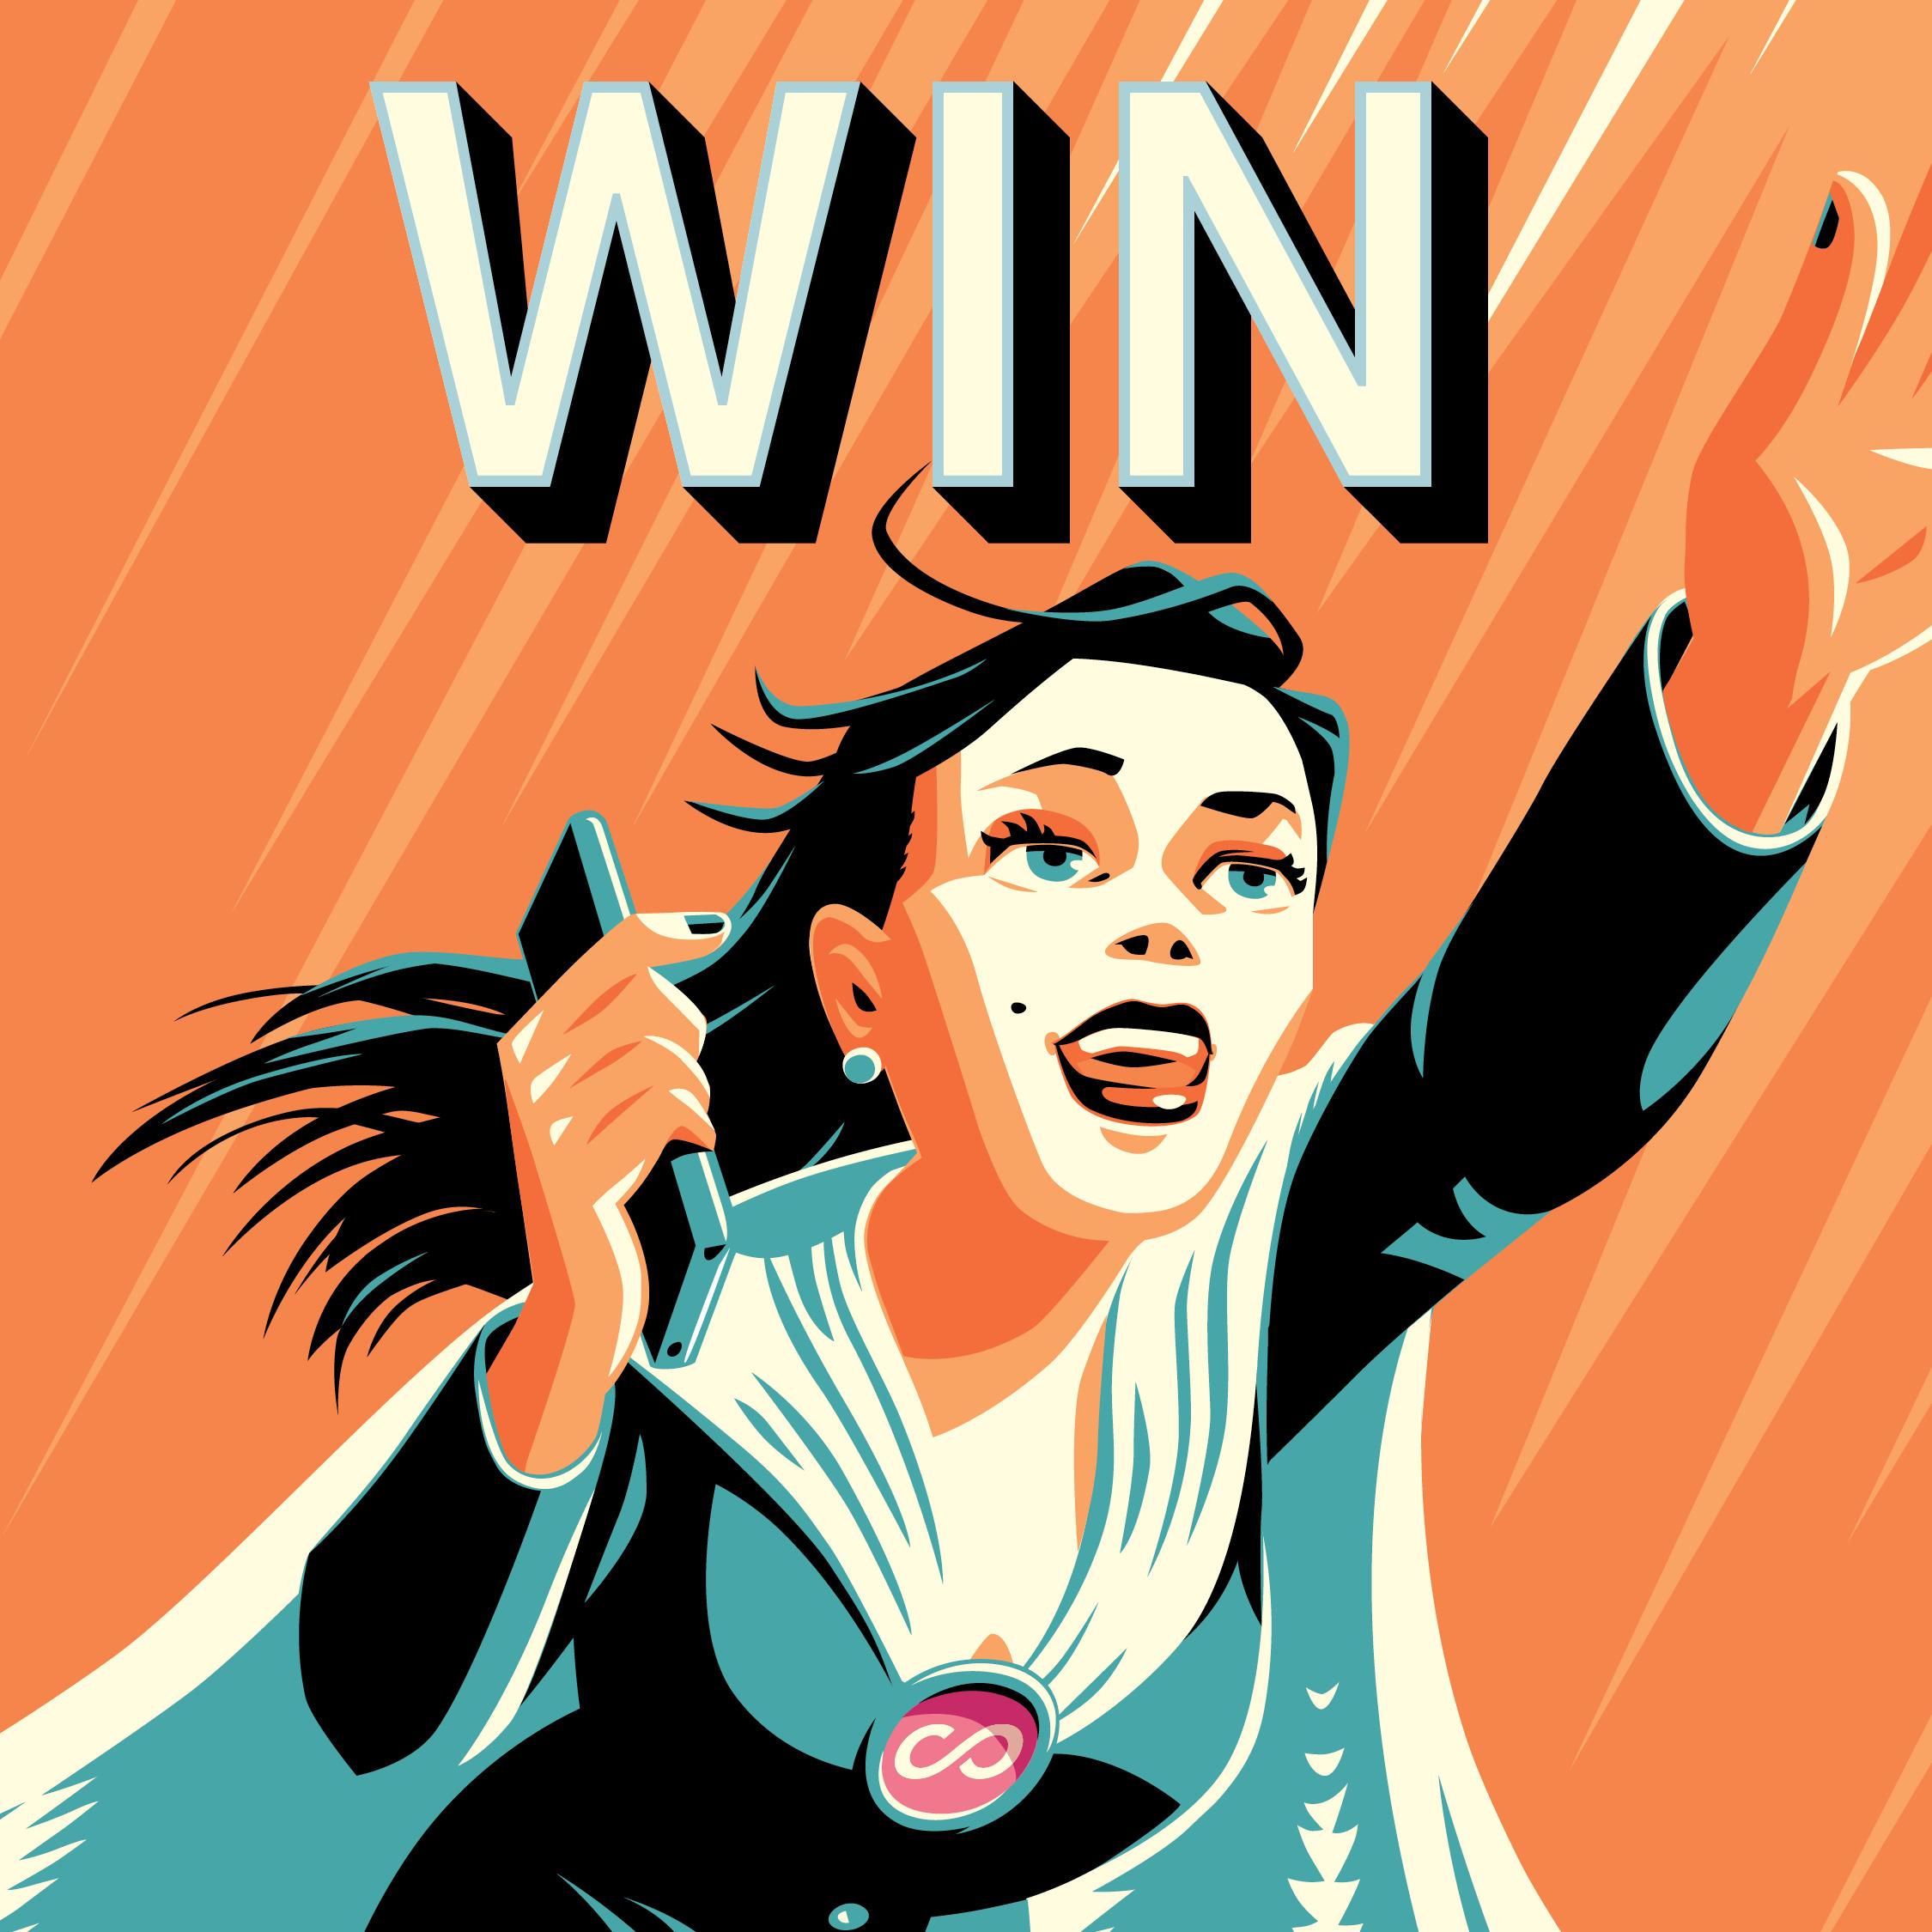 Web Tile - Hero girl 'Win' close up -